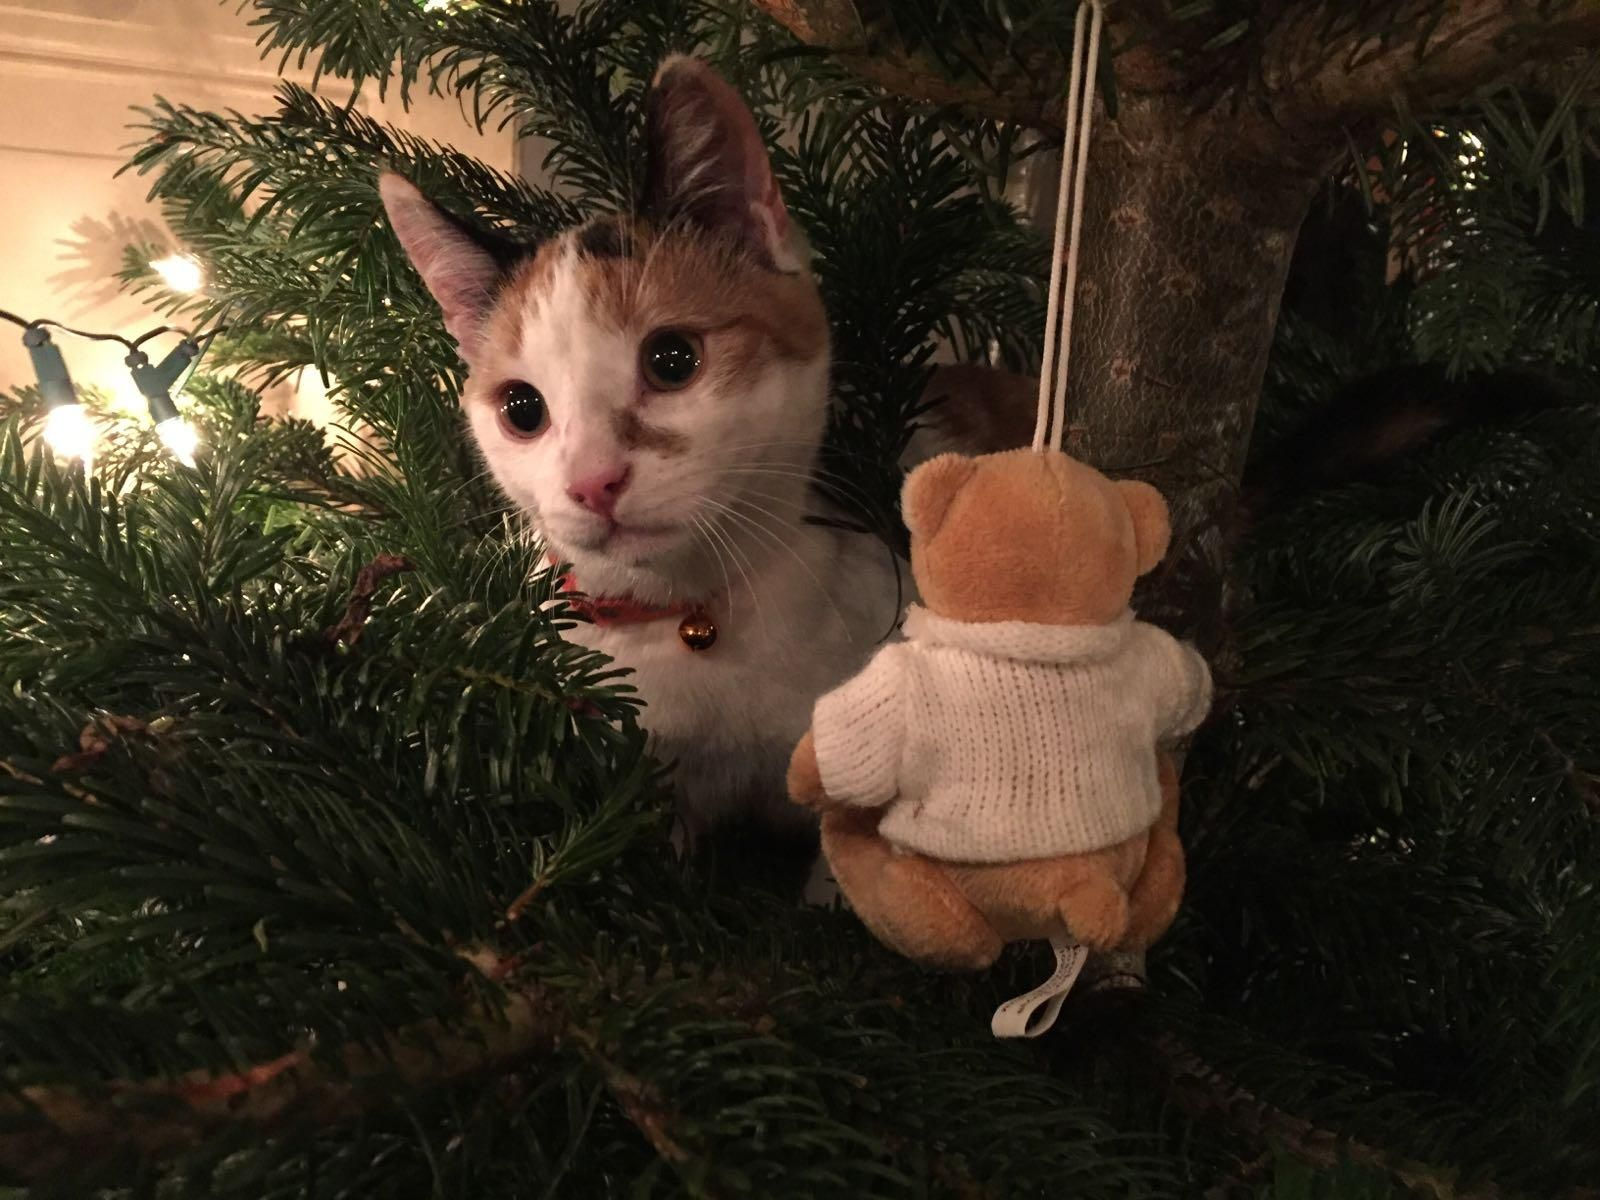 First Christmas for this little fella http://ift.tt/2hixVUW